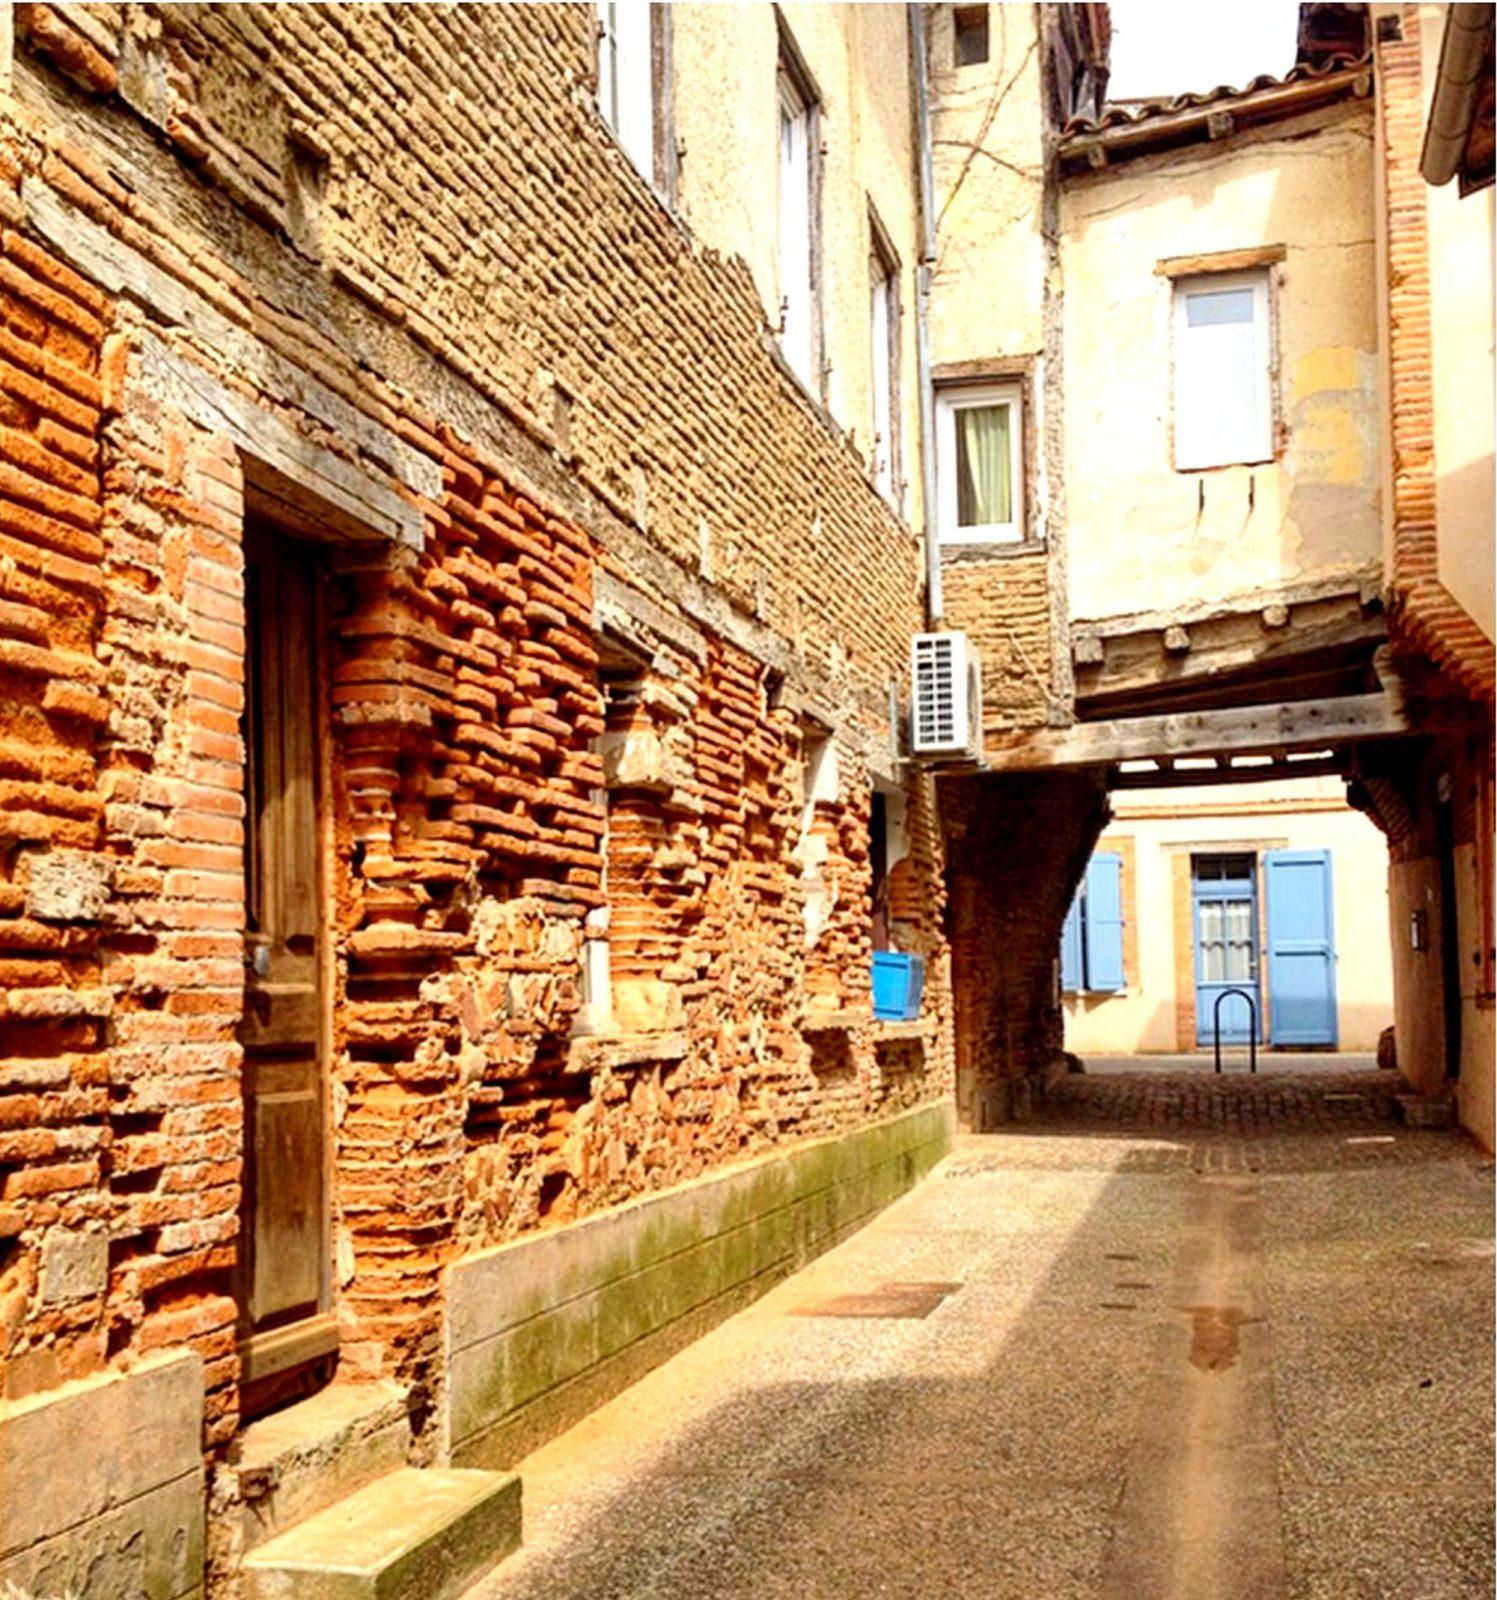 Maison à Pontet – Bastide Saint-Sulpice – Tarn